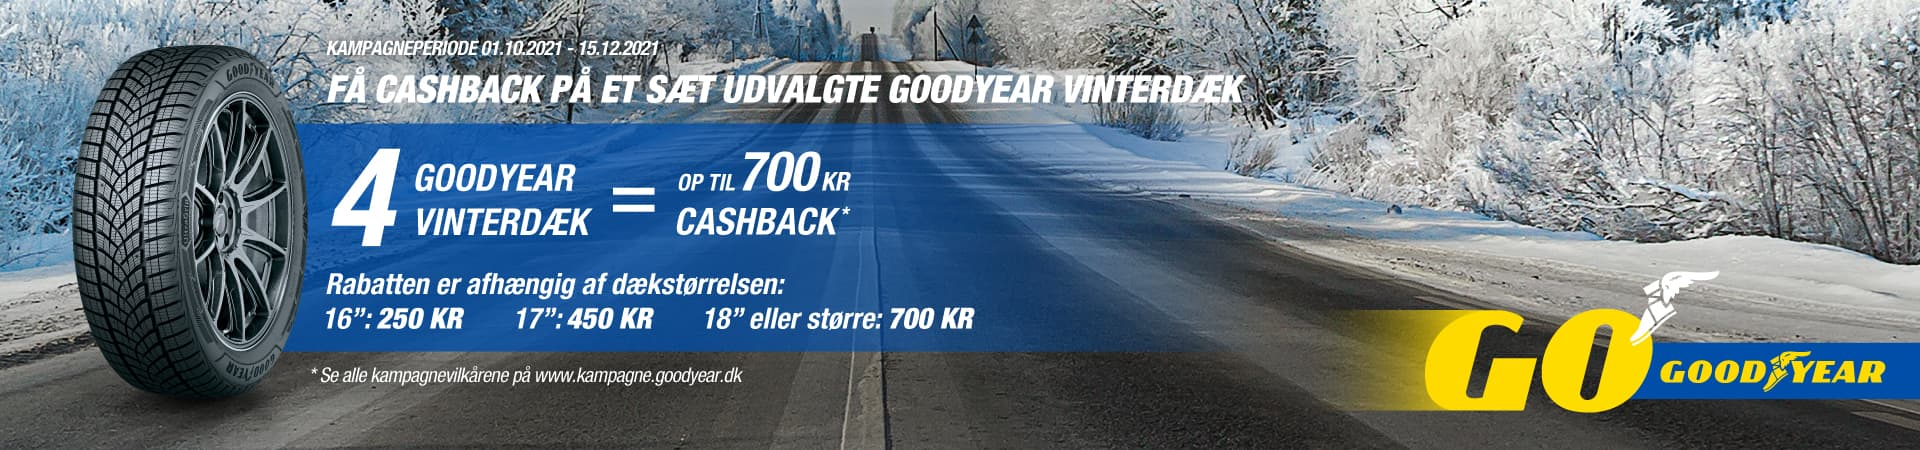 Winter_2021-22-Goodyear-cashback-banners-1920x450-DK